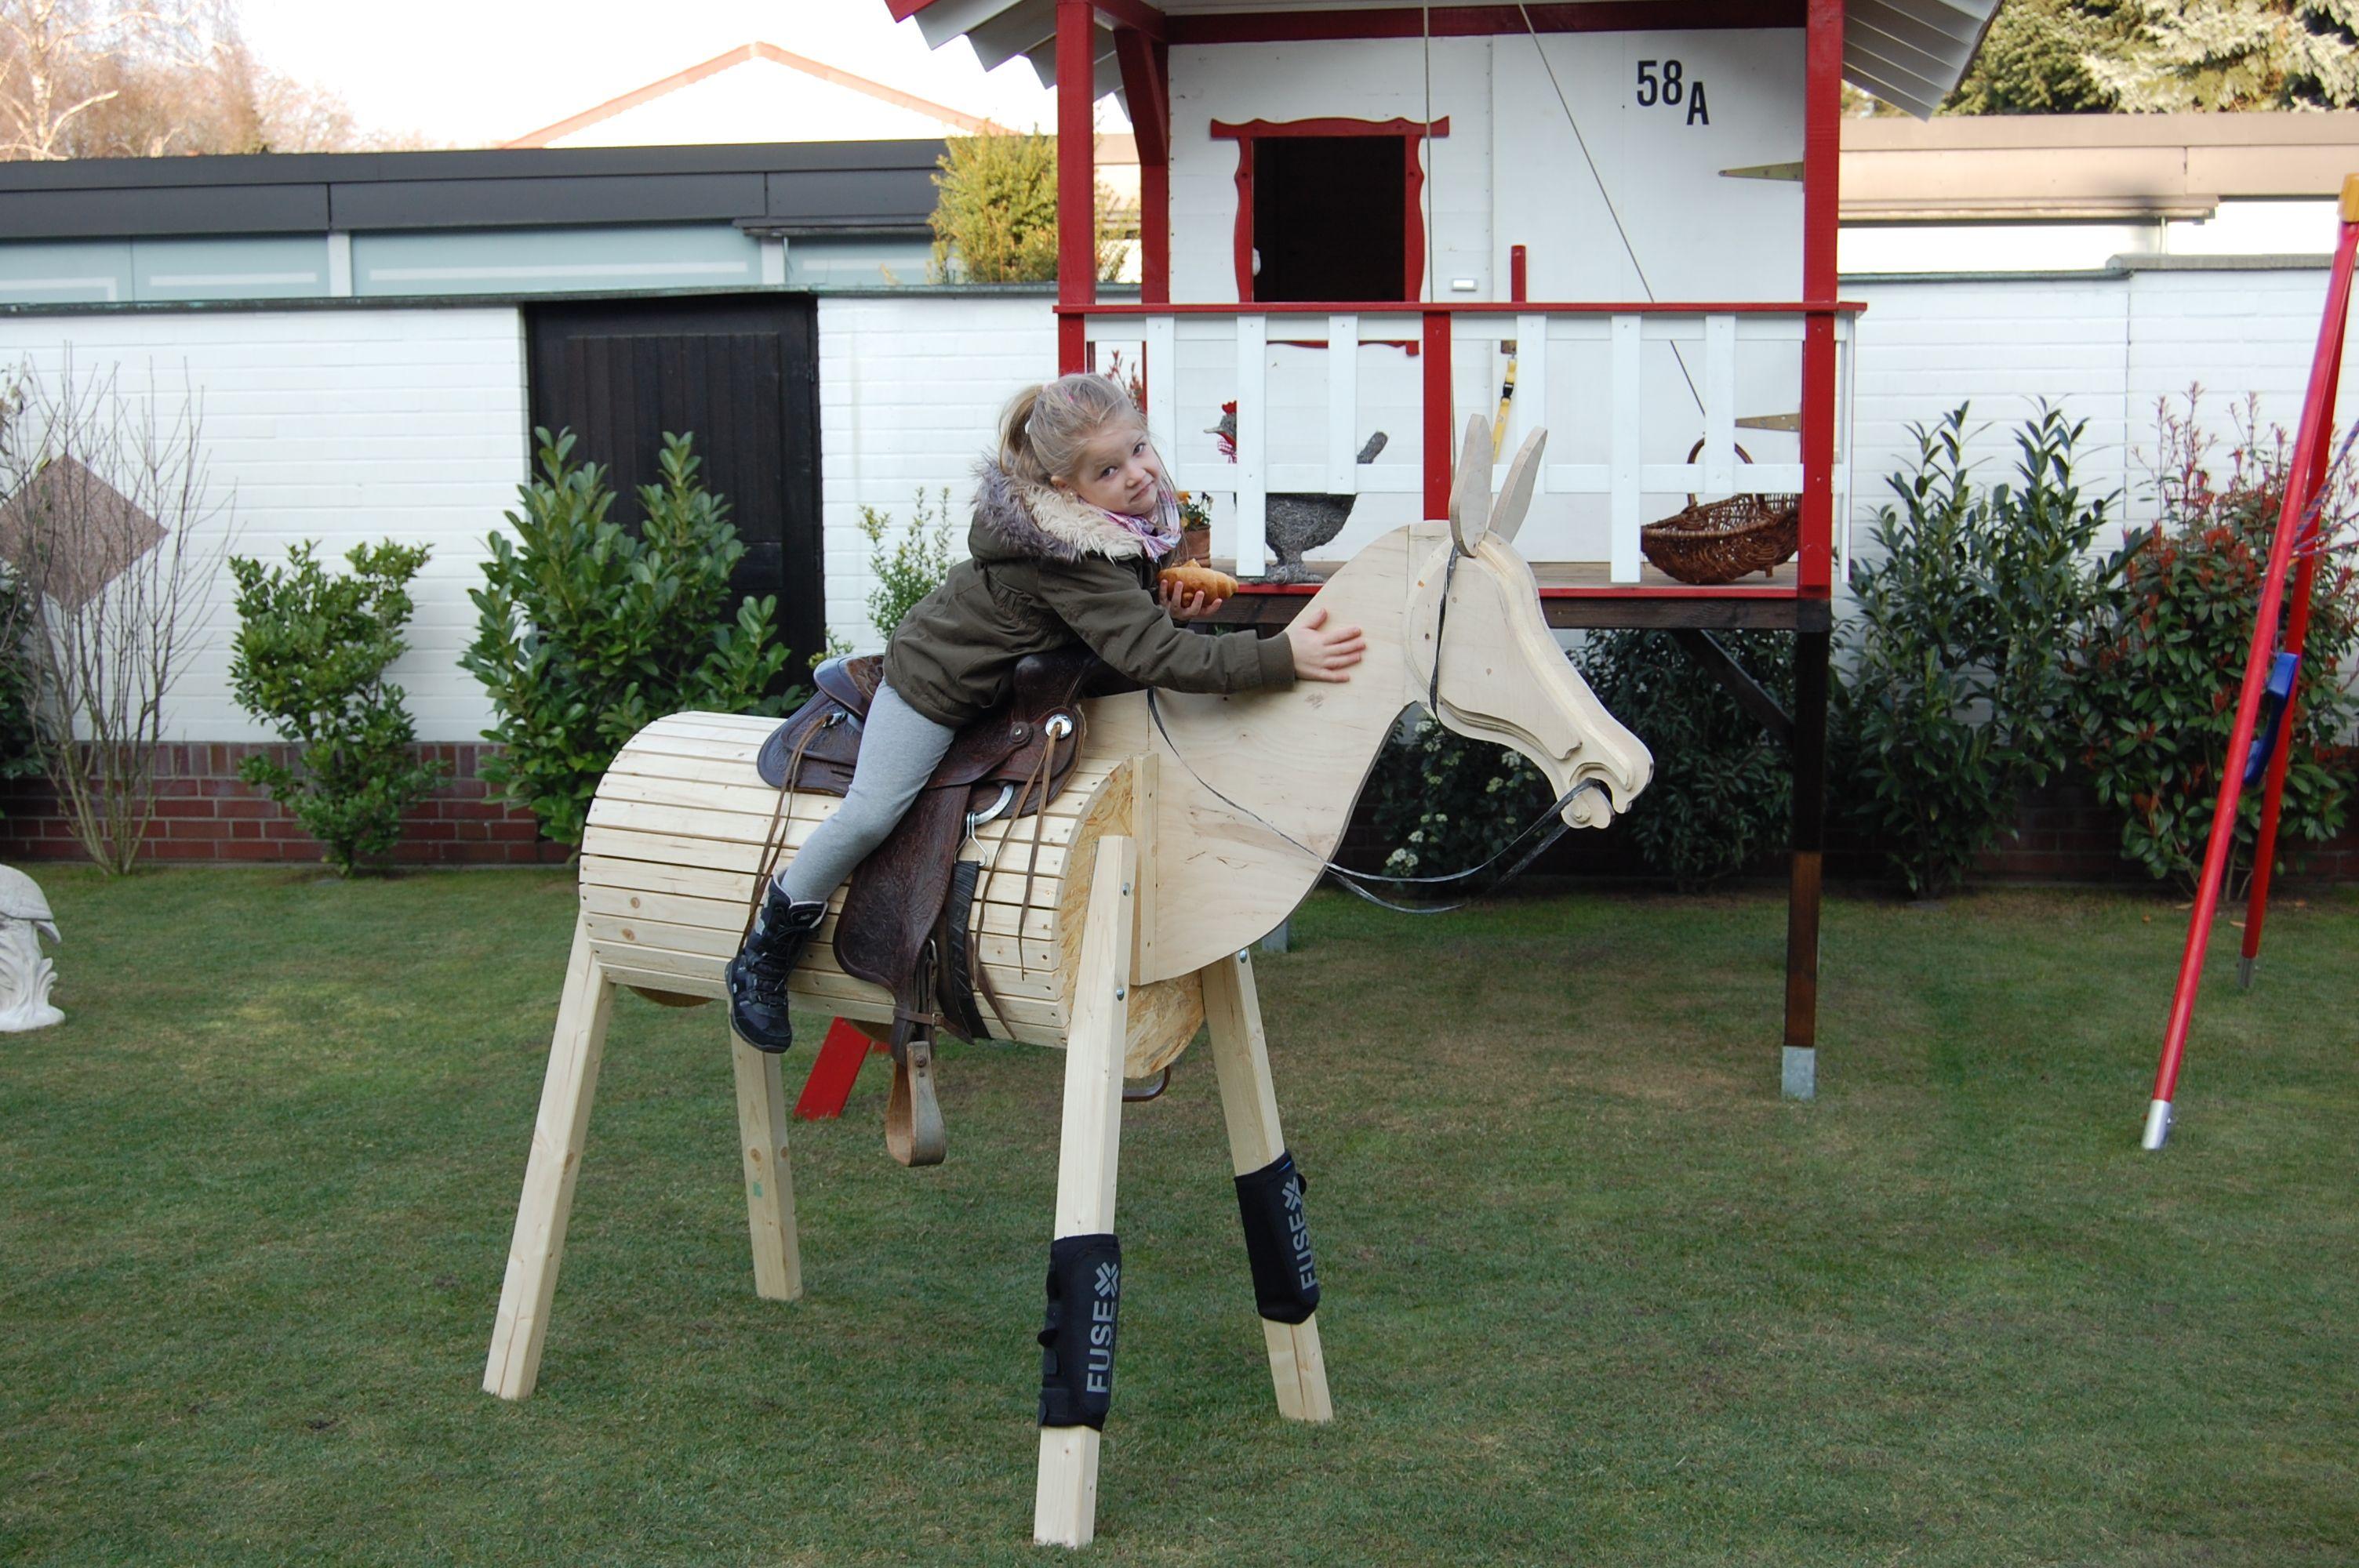 volitirpferd holzpferd bauanleitung zum selber bauen garten pinterest holzpferd pferde. Black Bedroom Furniture Sets. Home Design Ideas